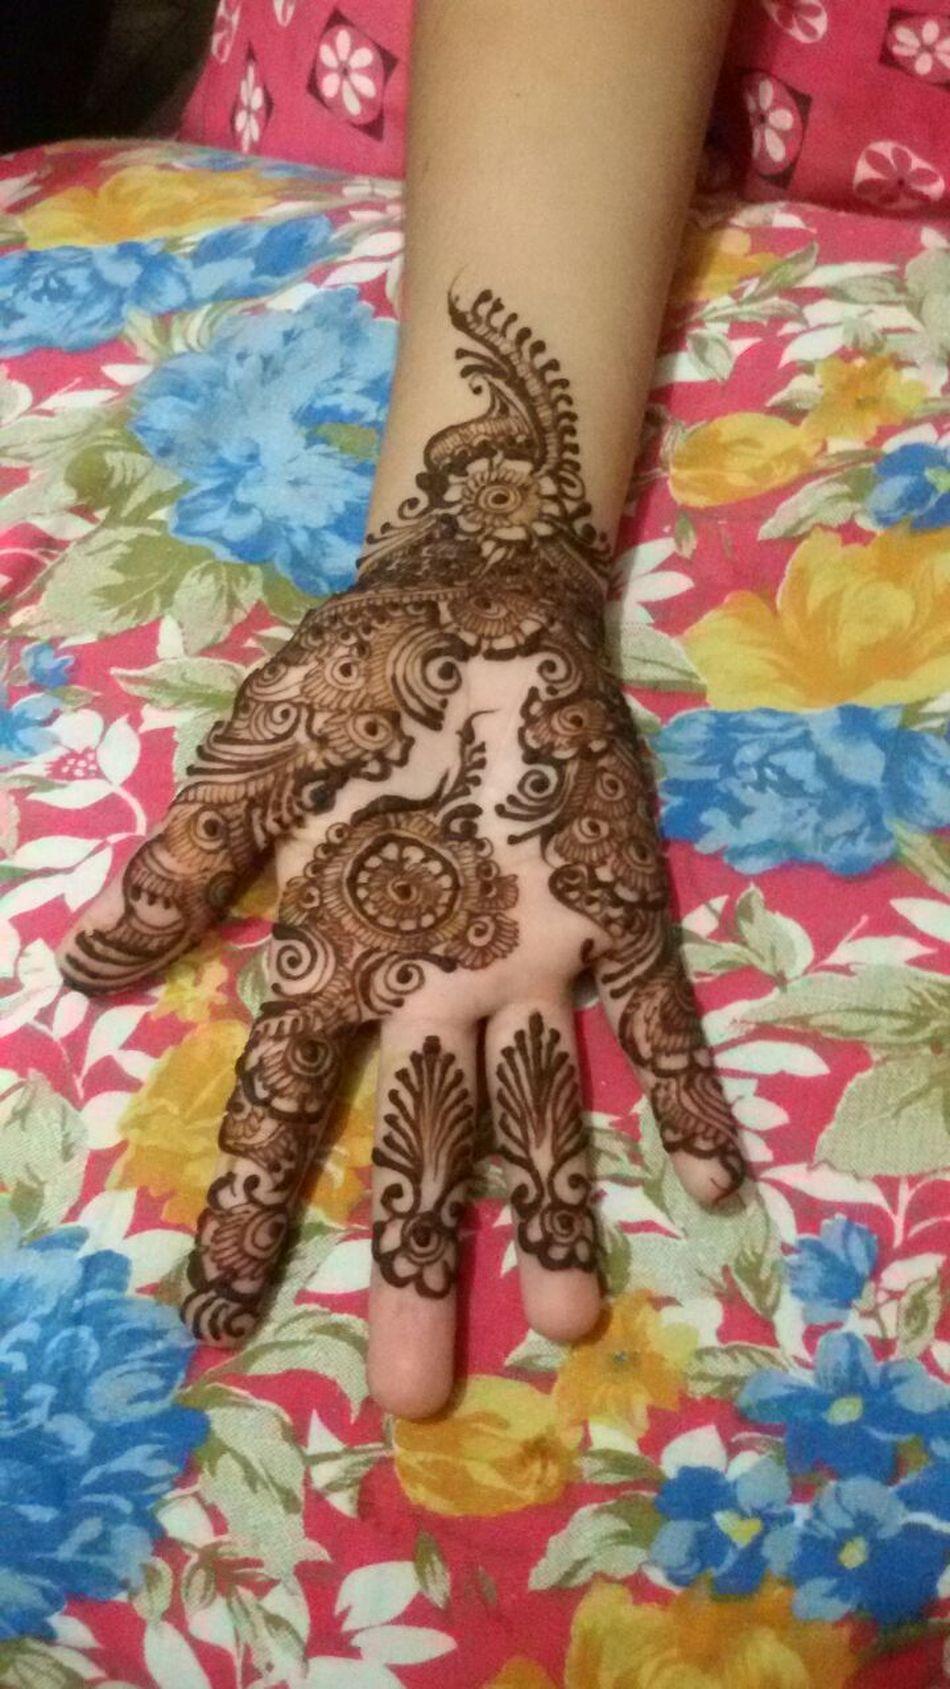 Creativity Art And Craft Art Human Hand Human Body Part Close-up High Angle View Design Henna Tattoo Henna Tattoo ❤ Parasngupta_photography